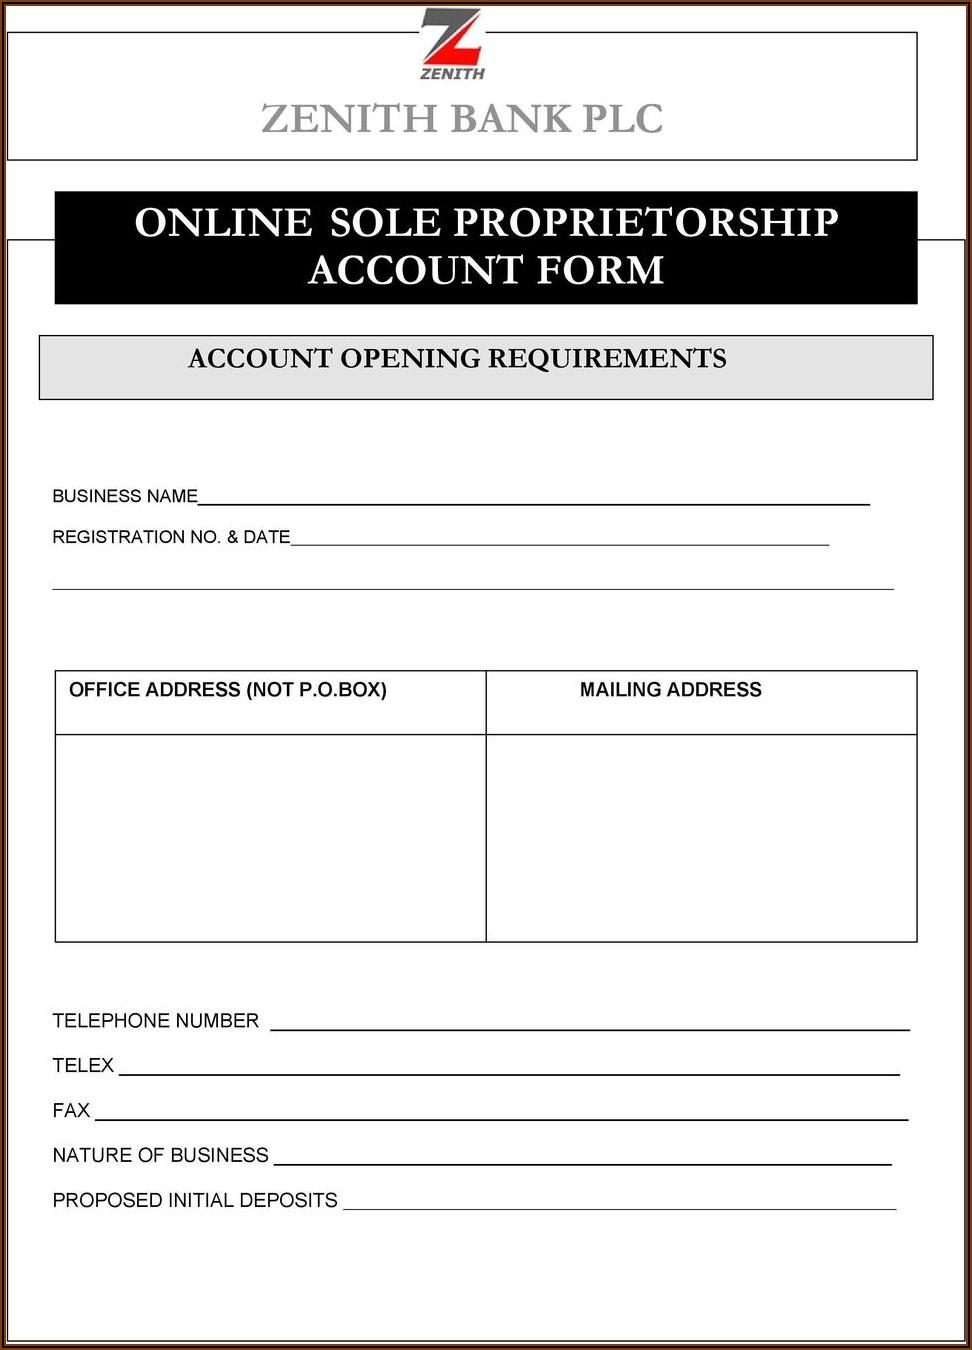 Zenith Bank Online Account Opening Form